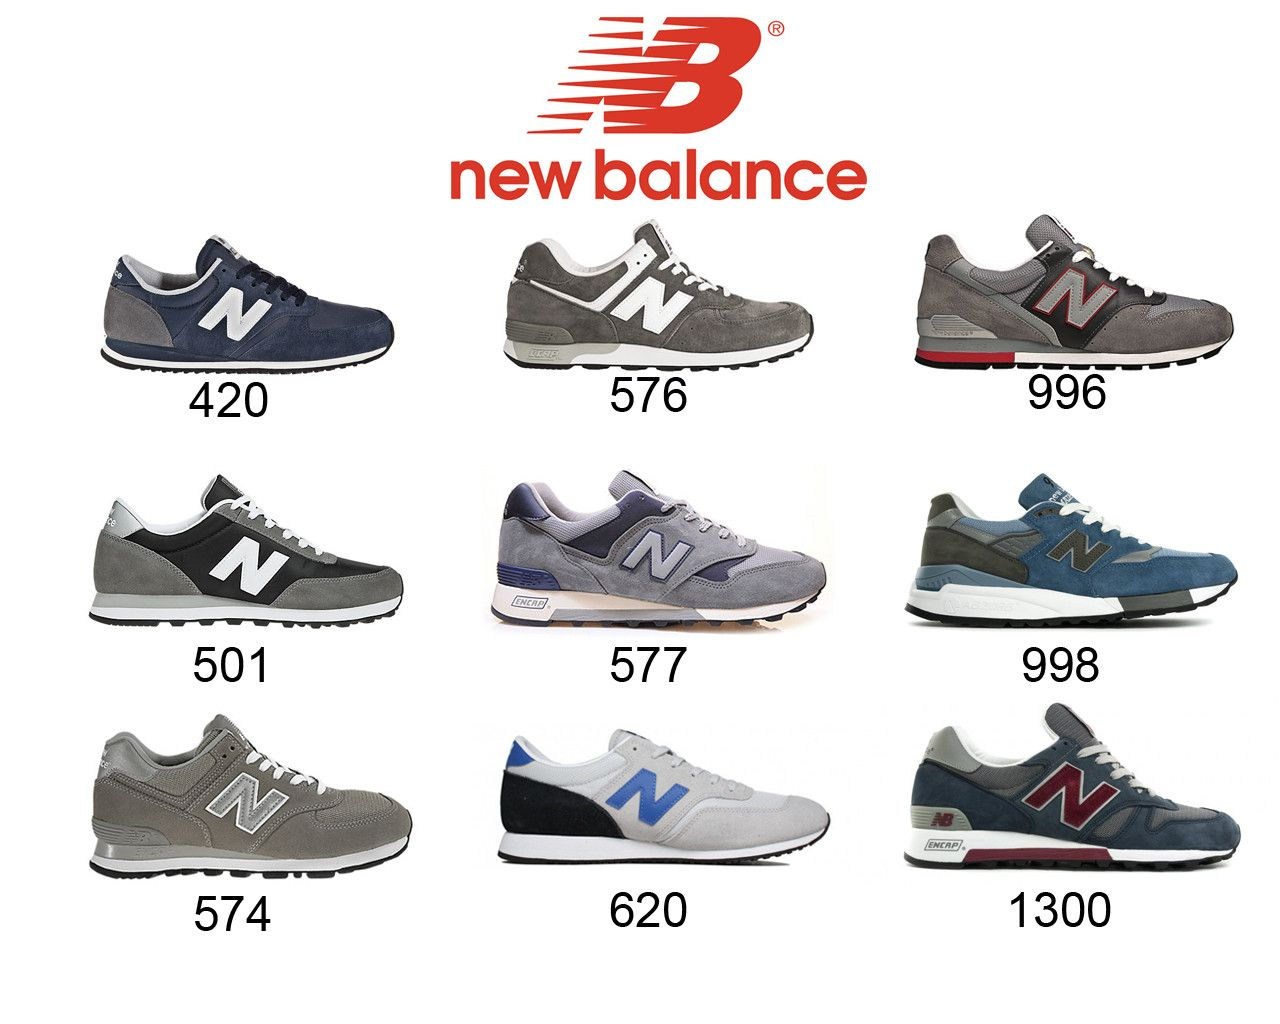 new balance 420 620